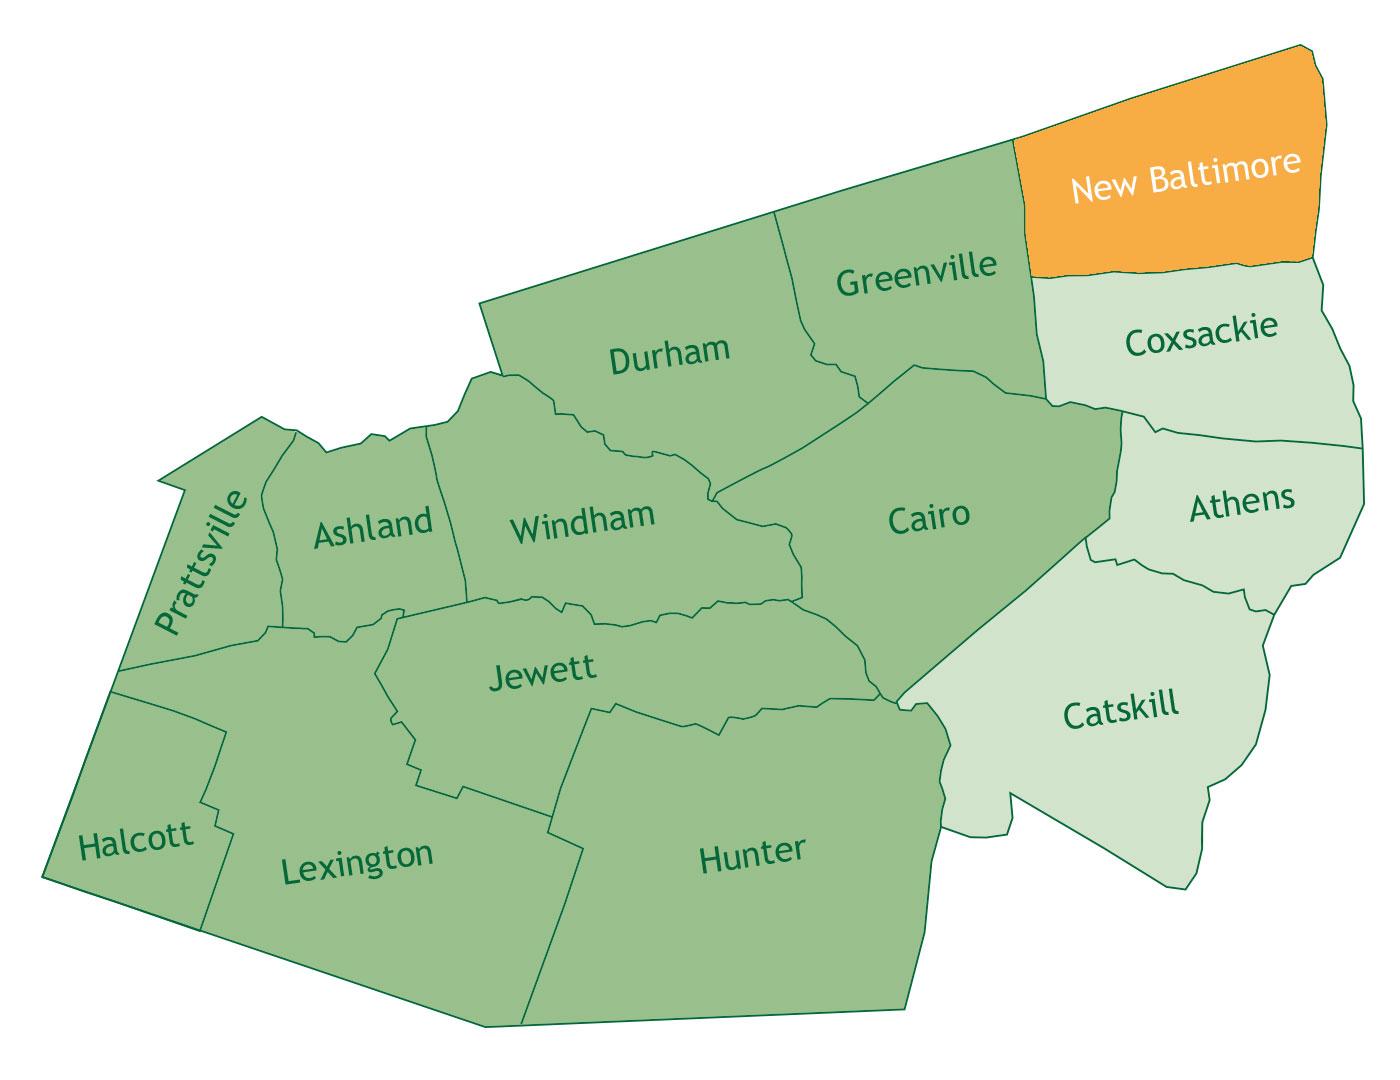 New Baltimore in Greene County